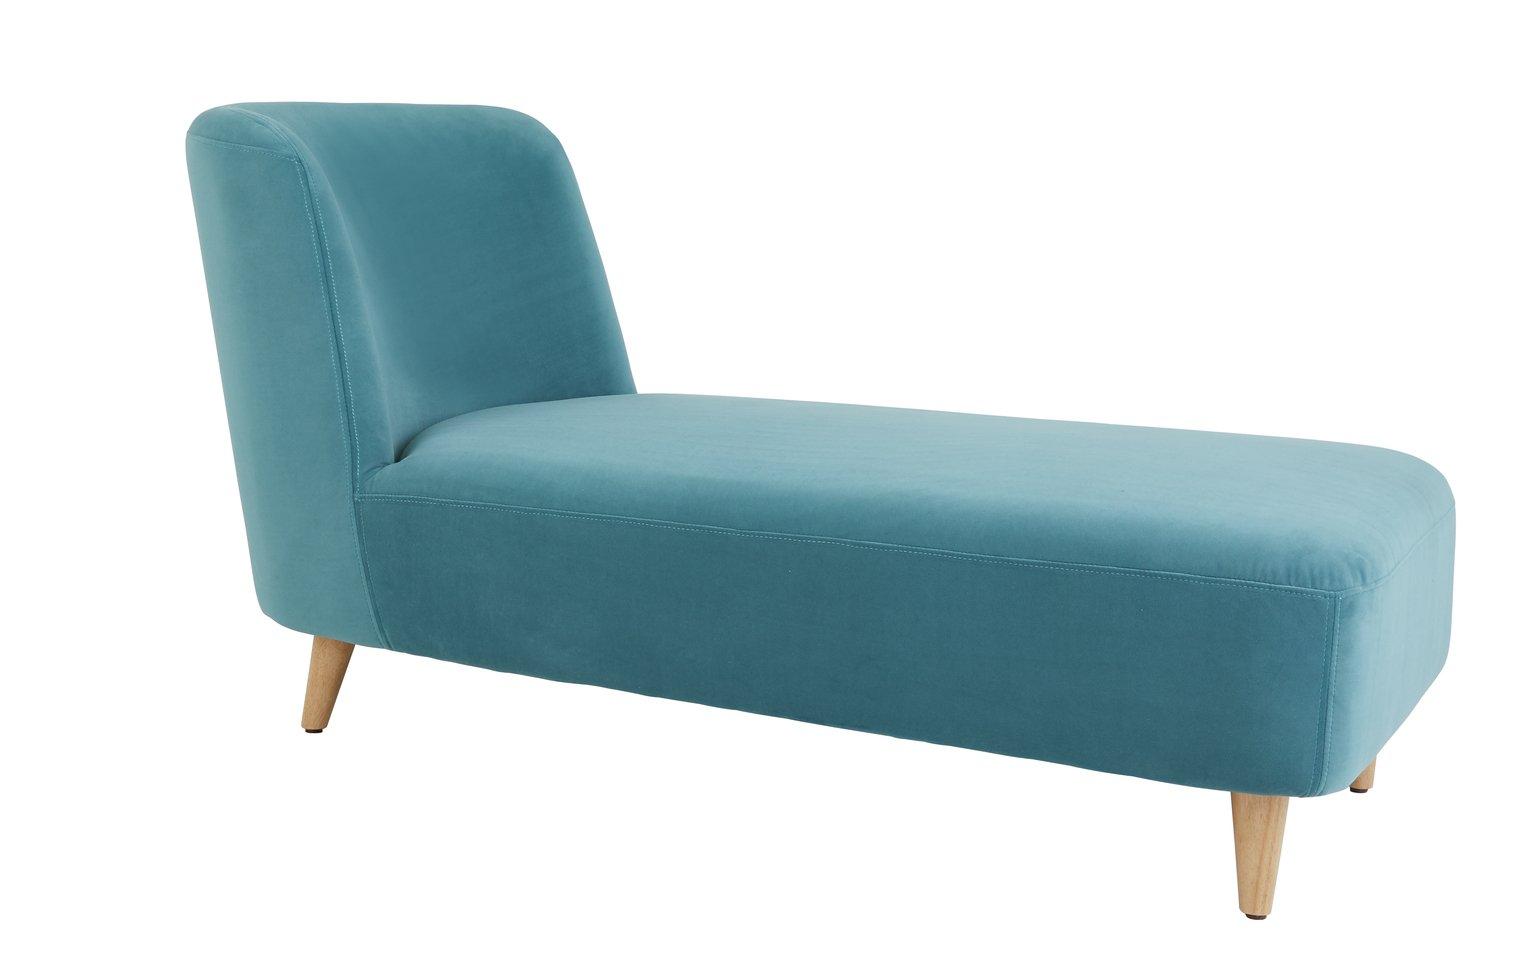 Habitat Daisy Velvet Chaise Sofa - Teal